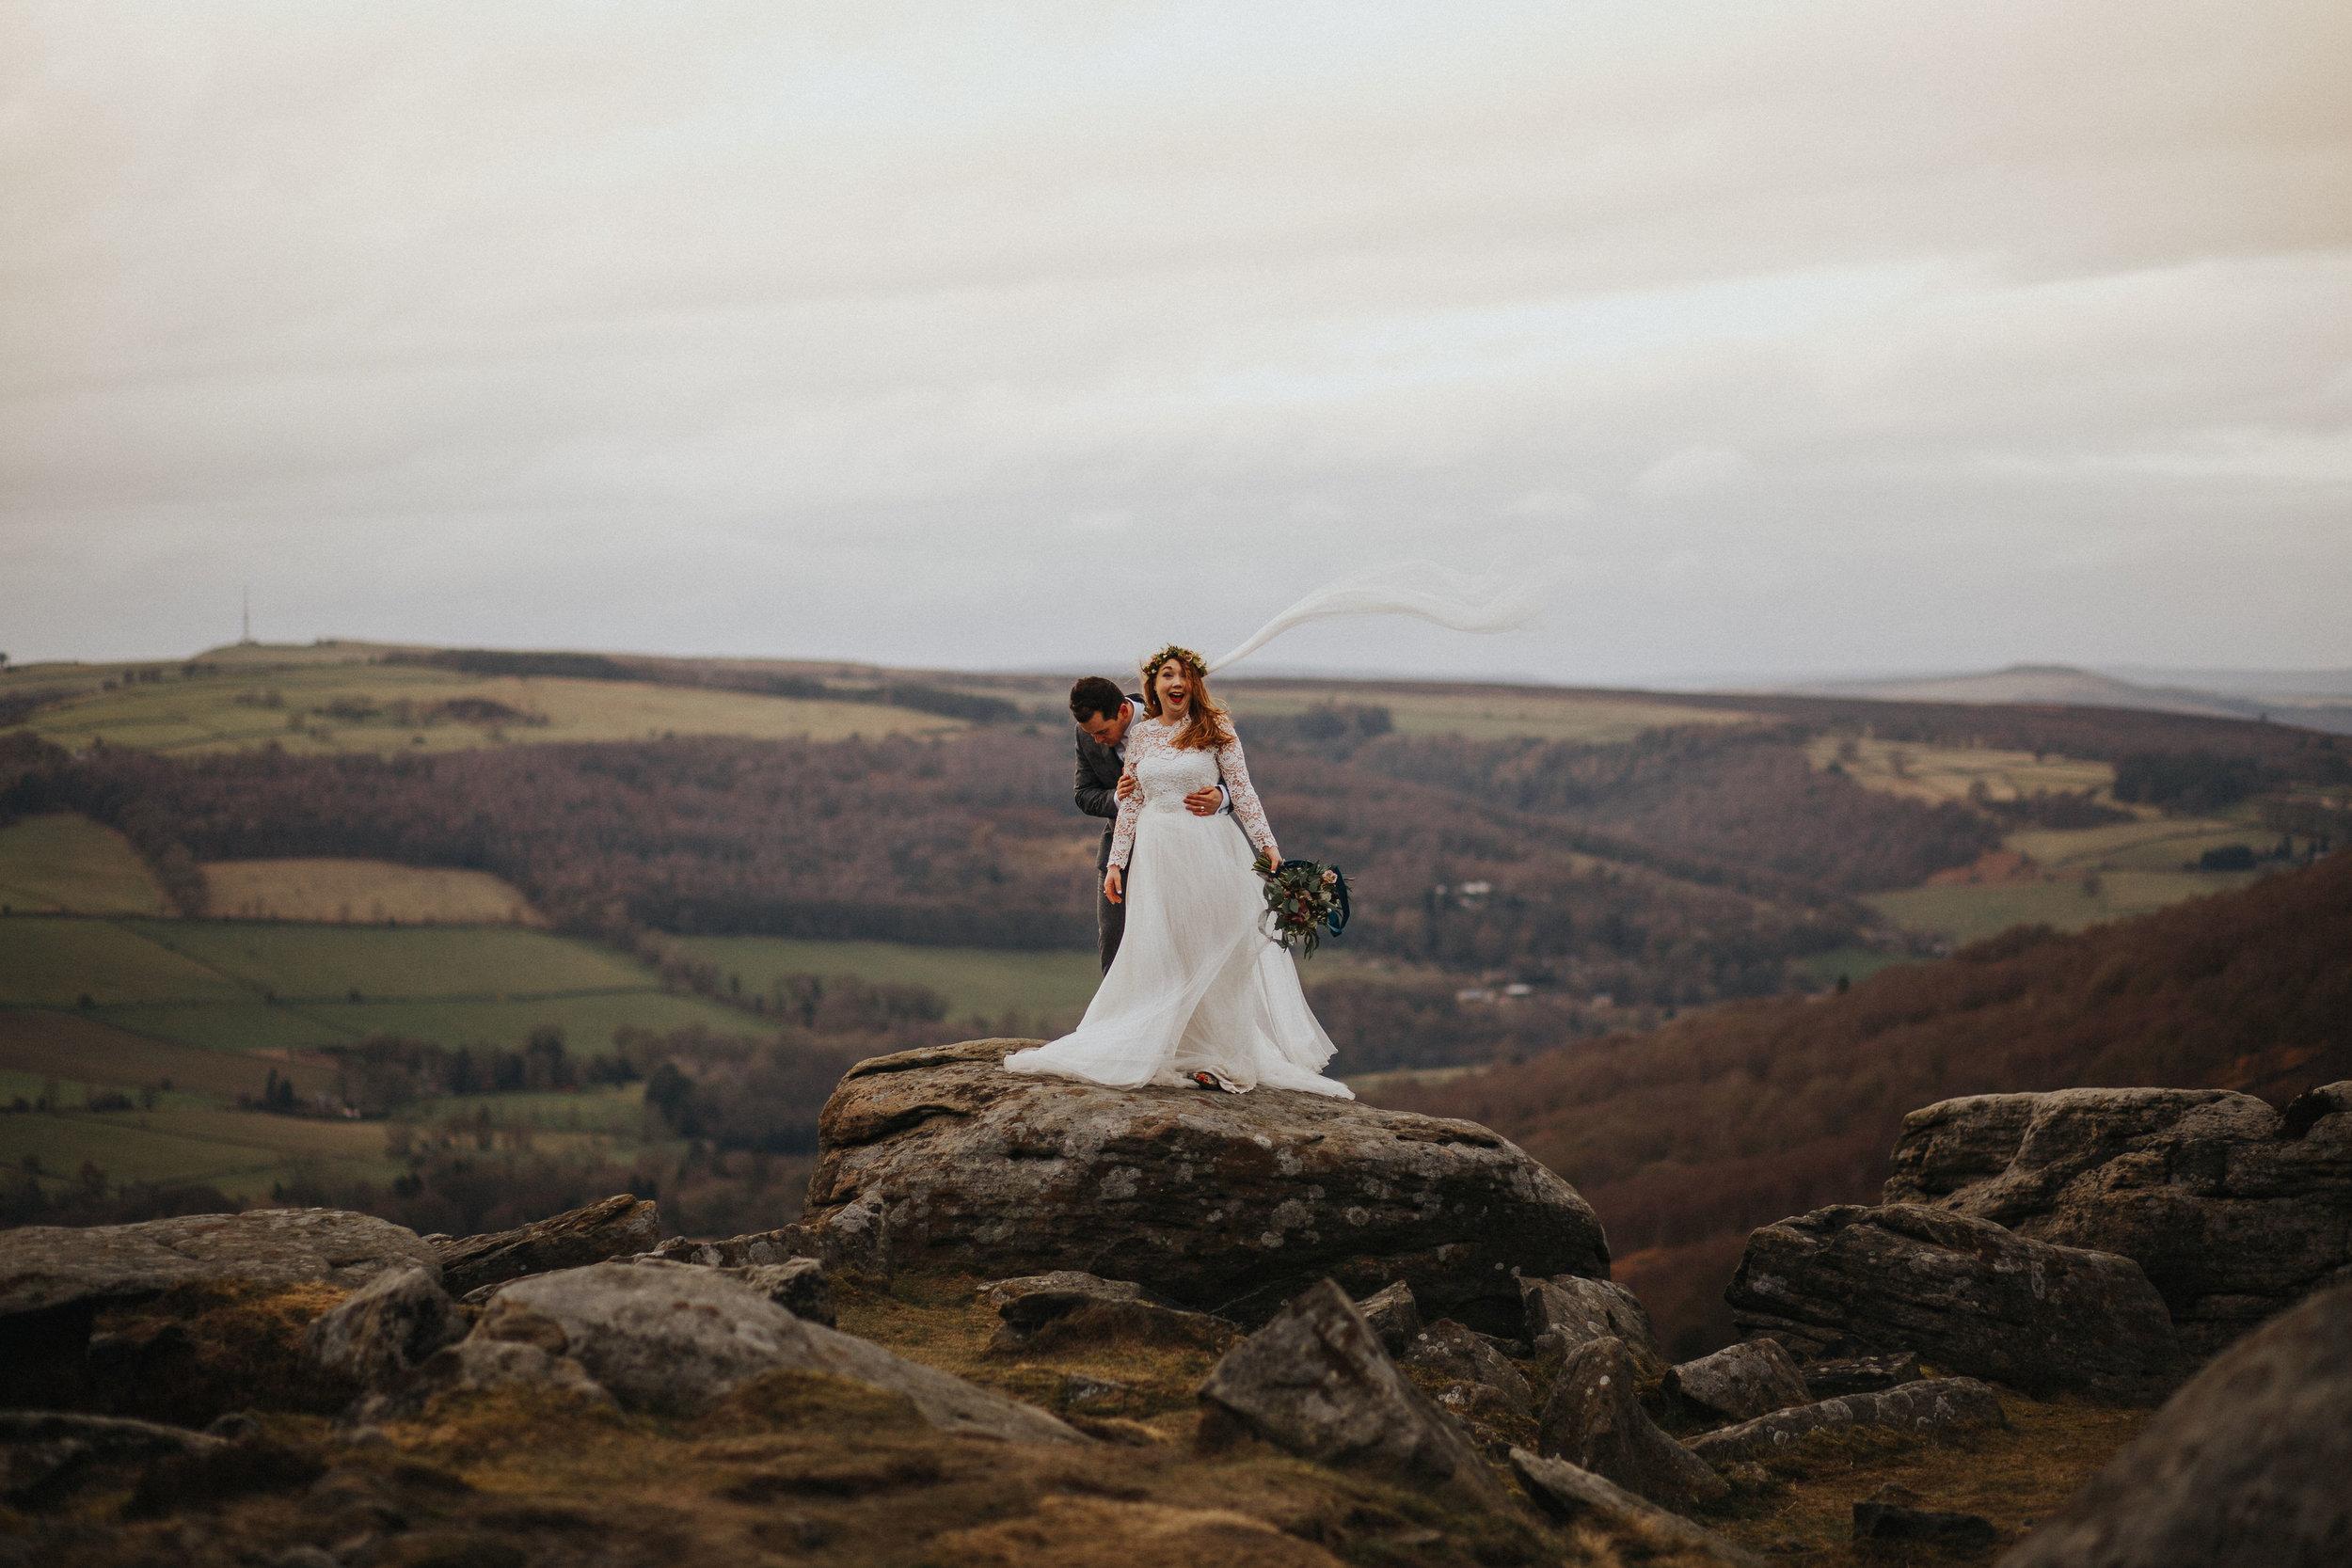 Rosie-bespoke-lace-long sleeved-tulle-wedding-dress-winter-peak district-susanna greening-28.jpg